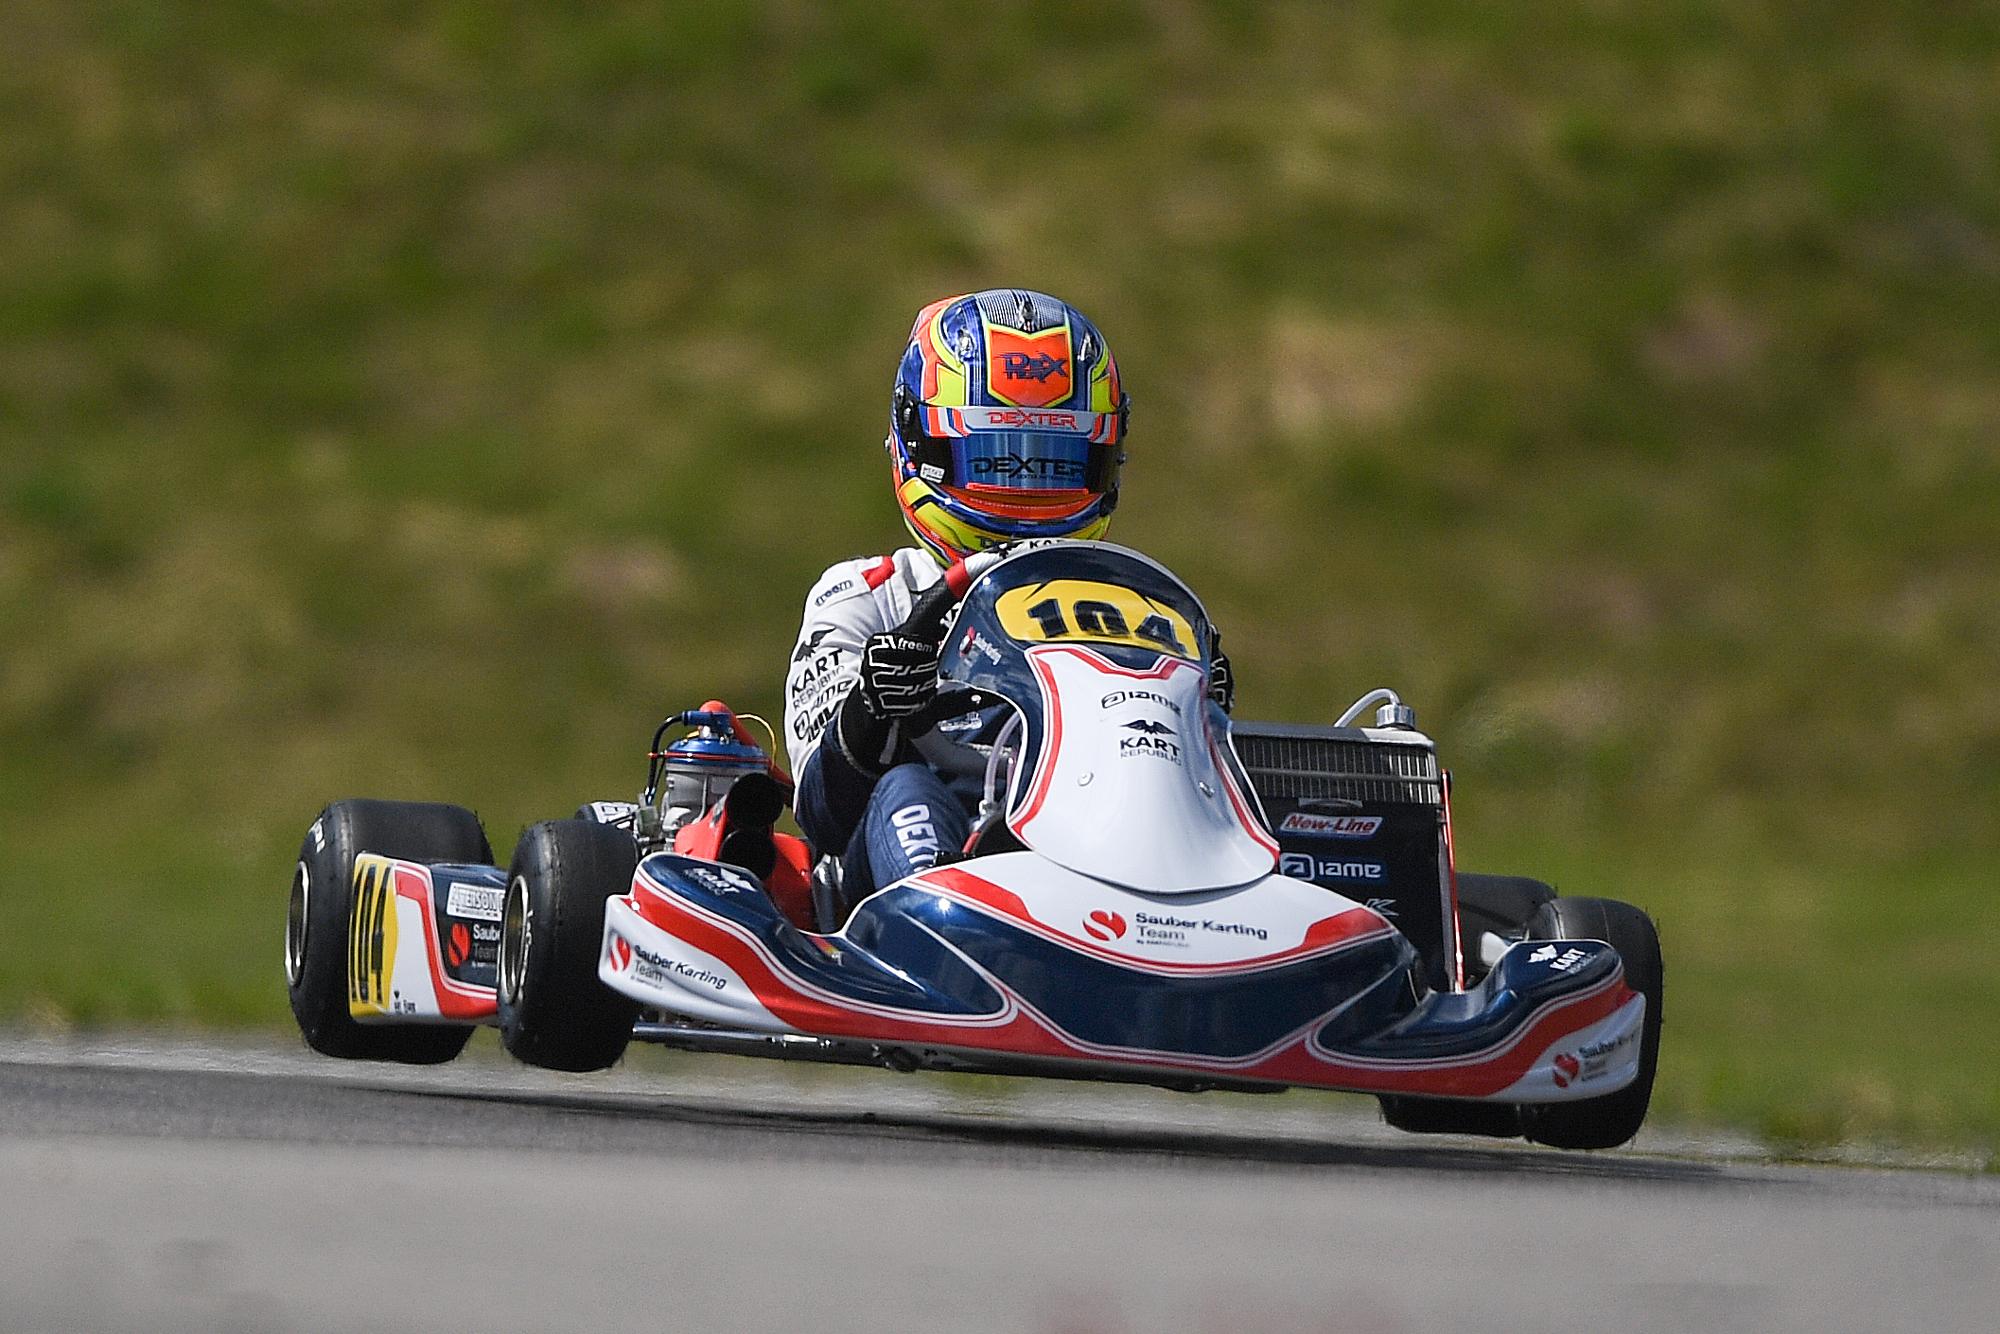 Sauber Karting Team Leaves Sweden Still Leading The Championship